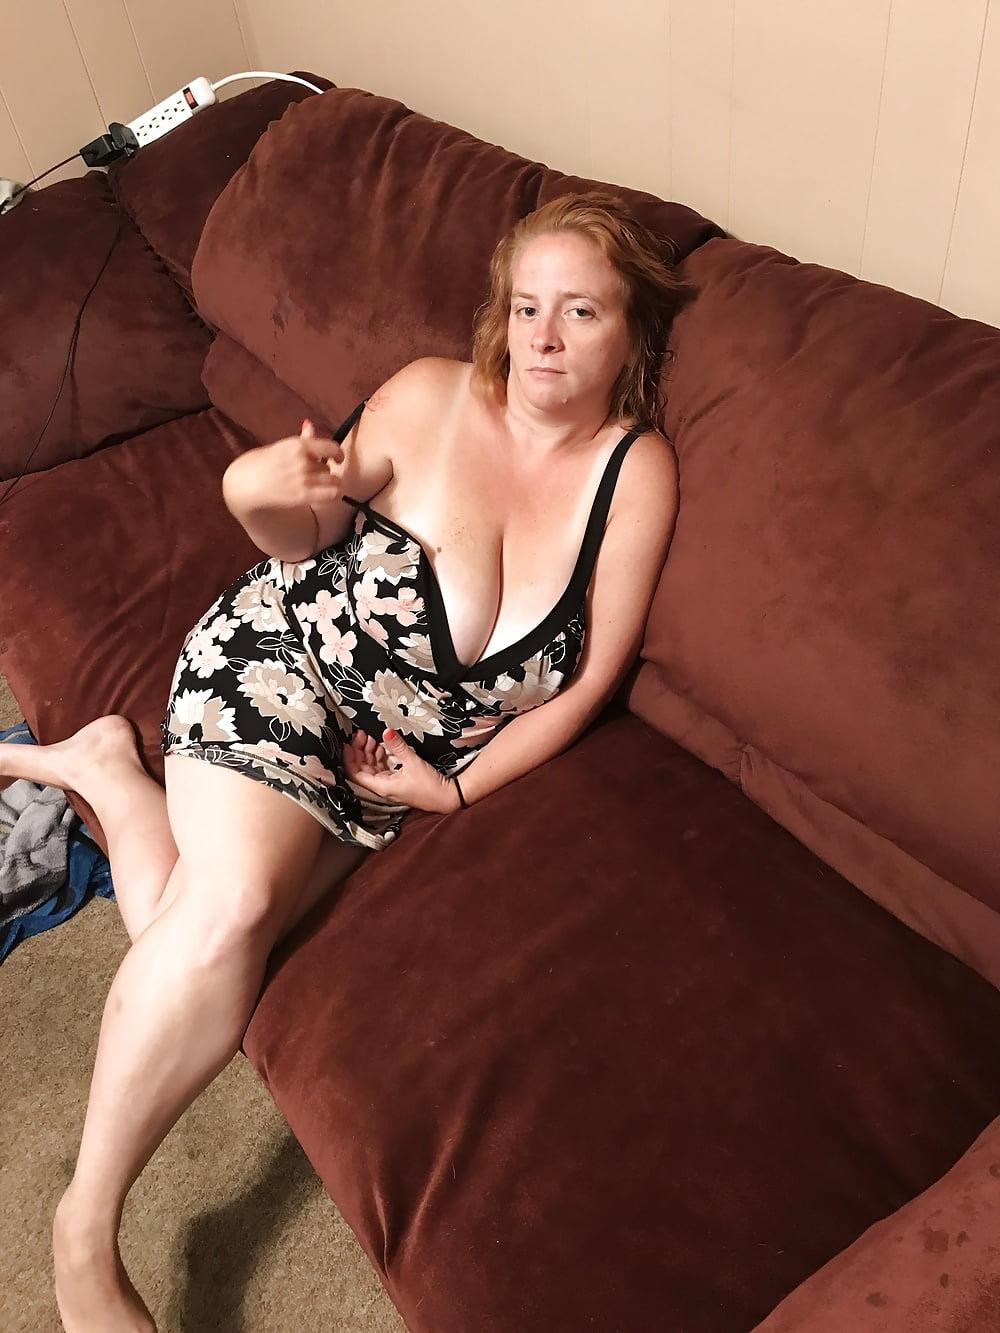 Share wife digital photo nude